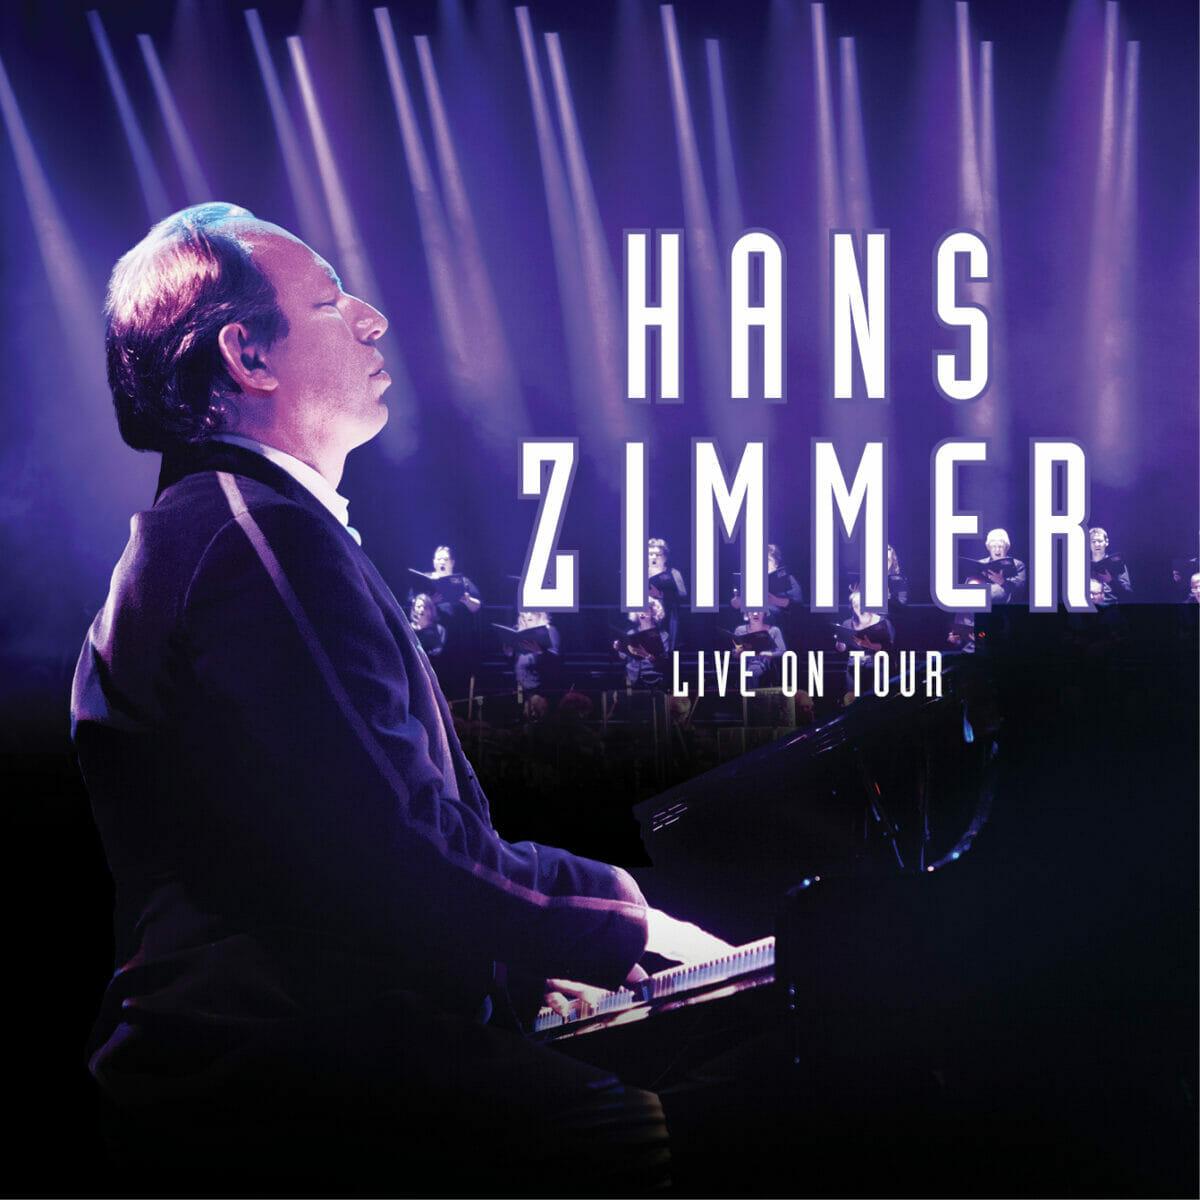 Hans-Zimmer-live